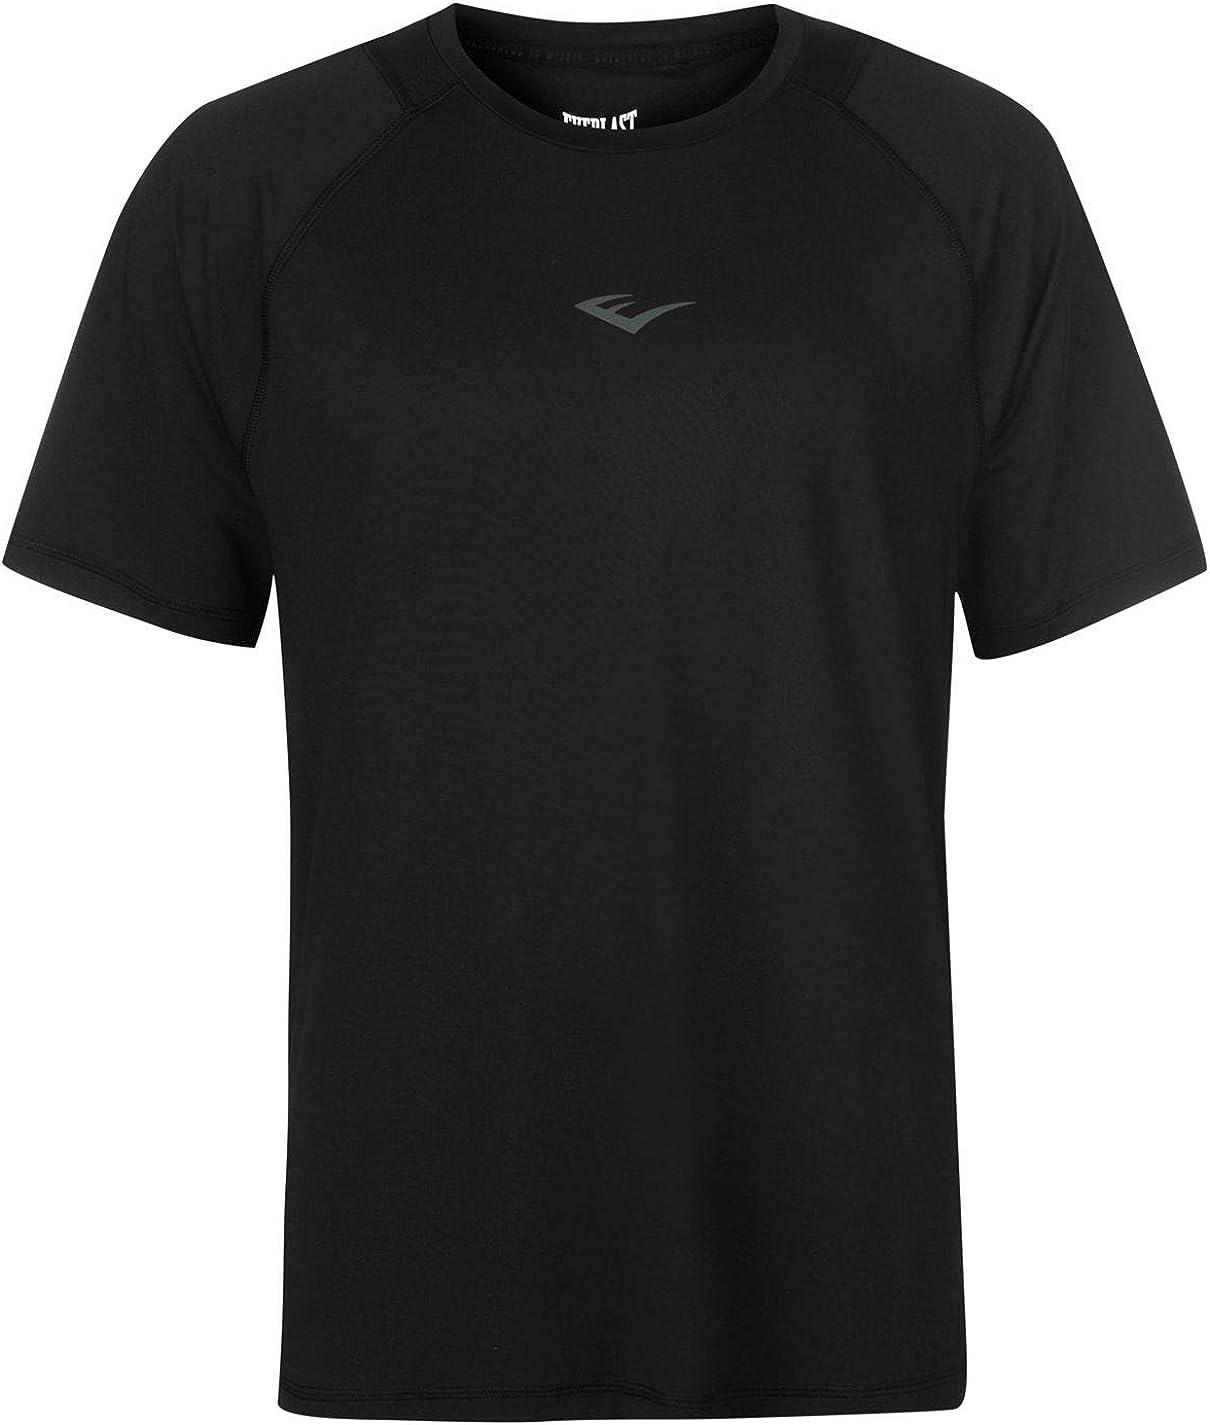 Everlast Hombre Poly Camiseta Manga Corta Negro S: Amazon.es: Ropa ...